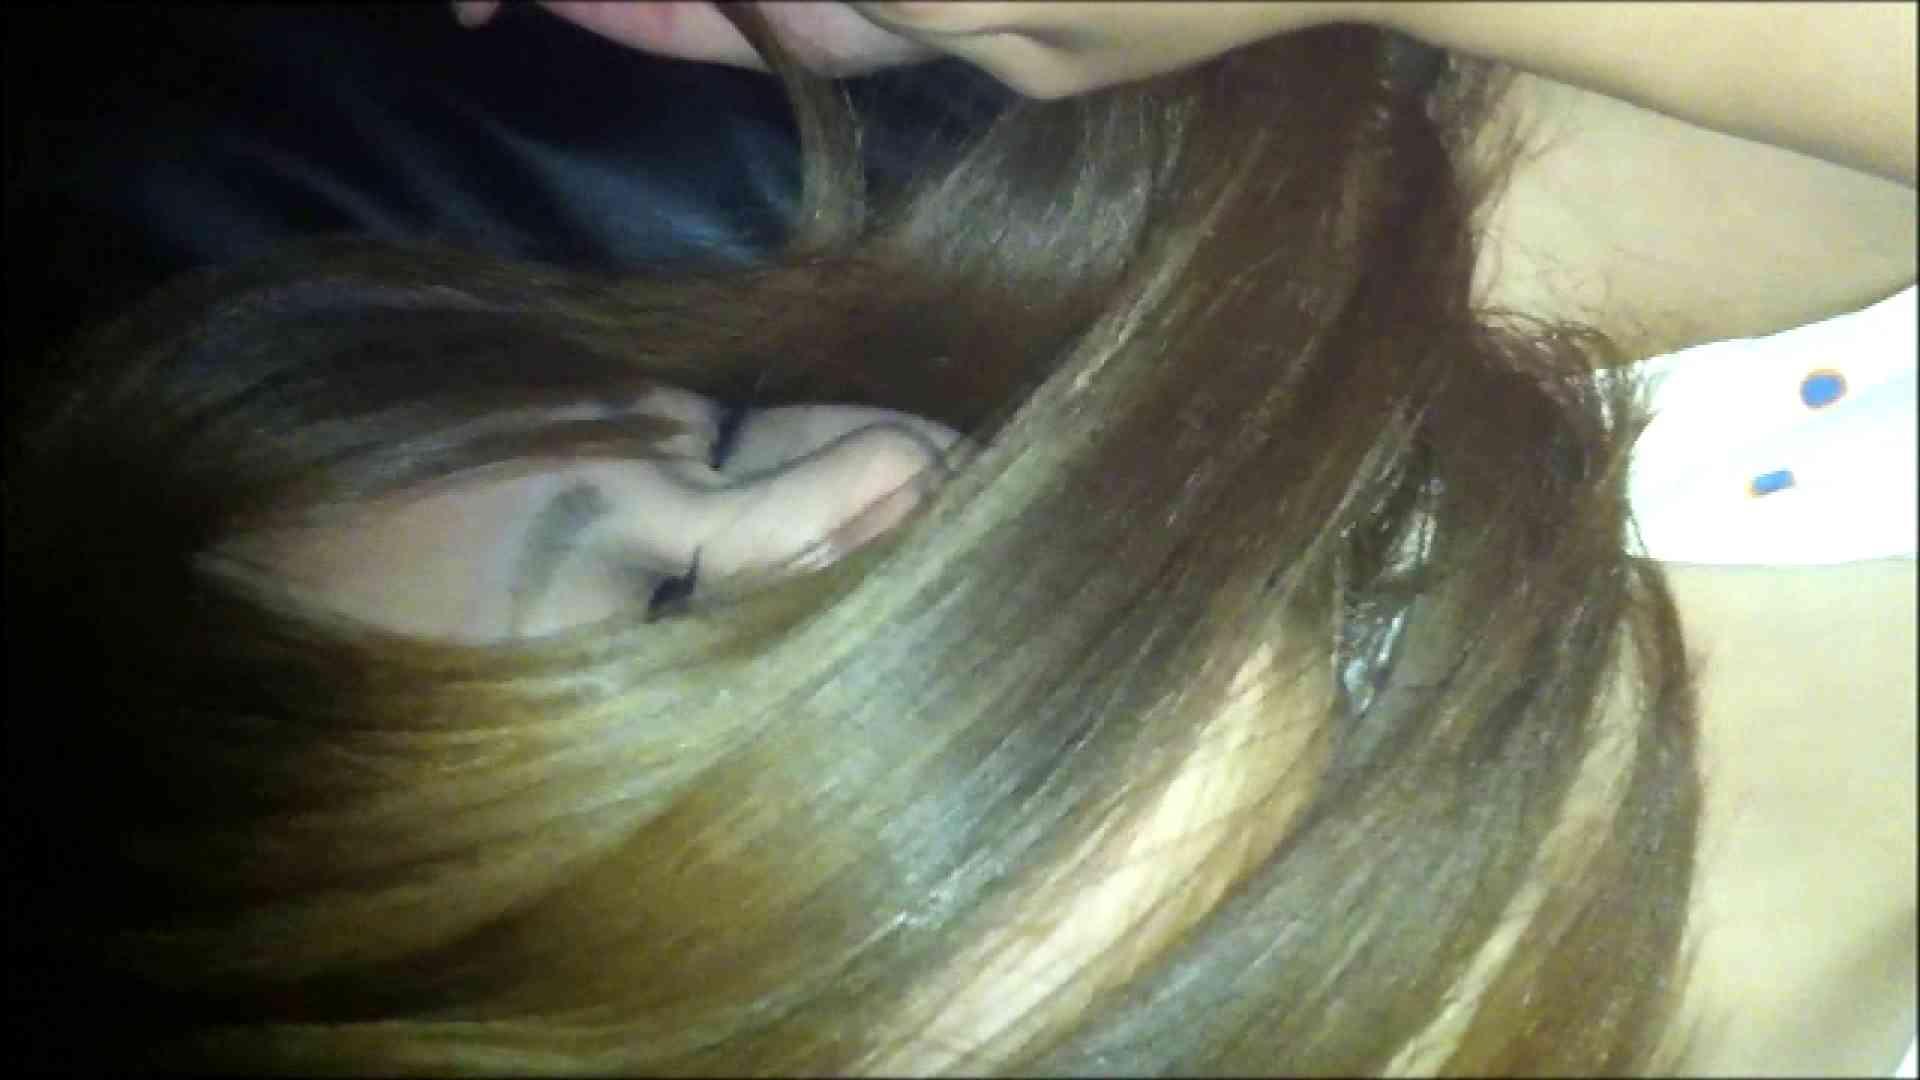 vol.3 【Eちゃん】イオン雑貨店店員 彼氏持ち 知人 隠し撮りセックス画像 89pic 29